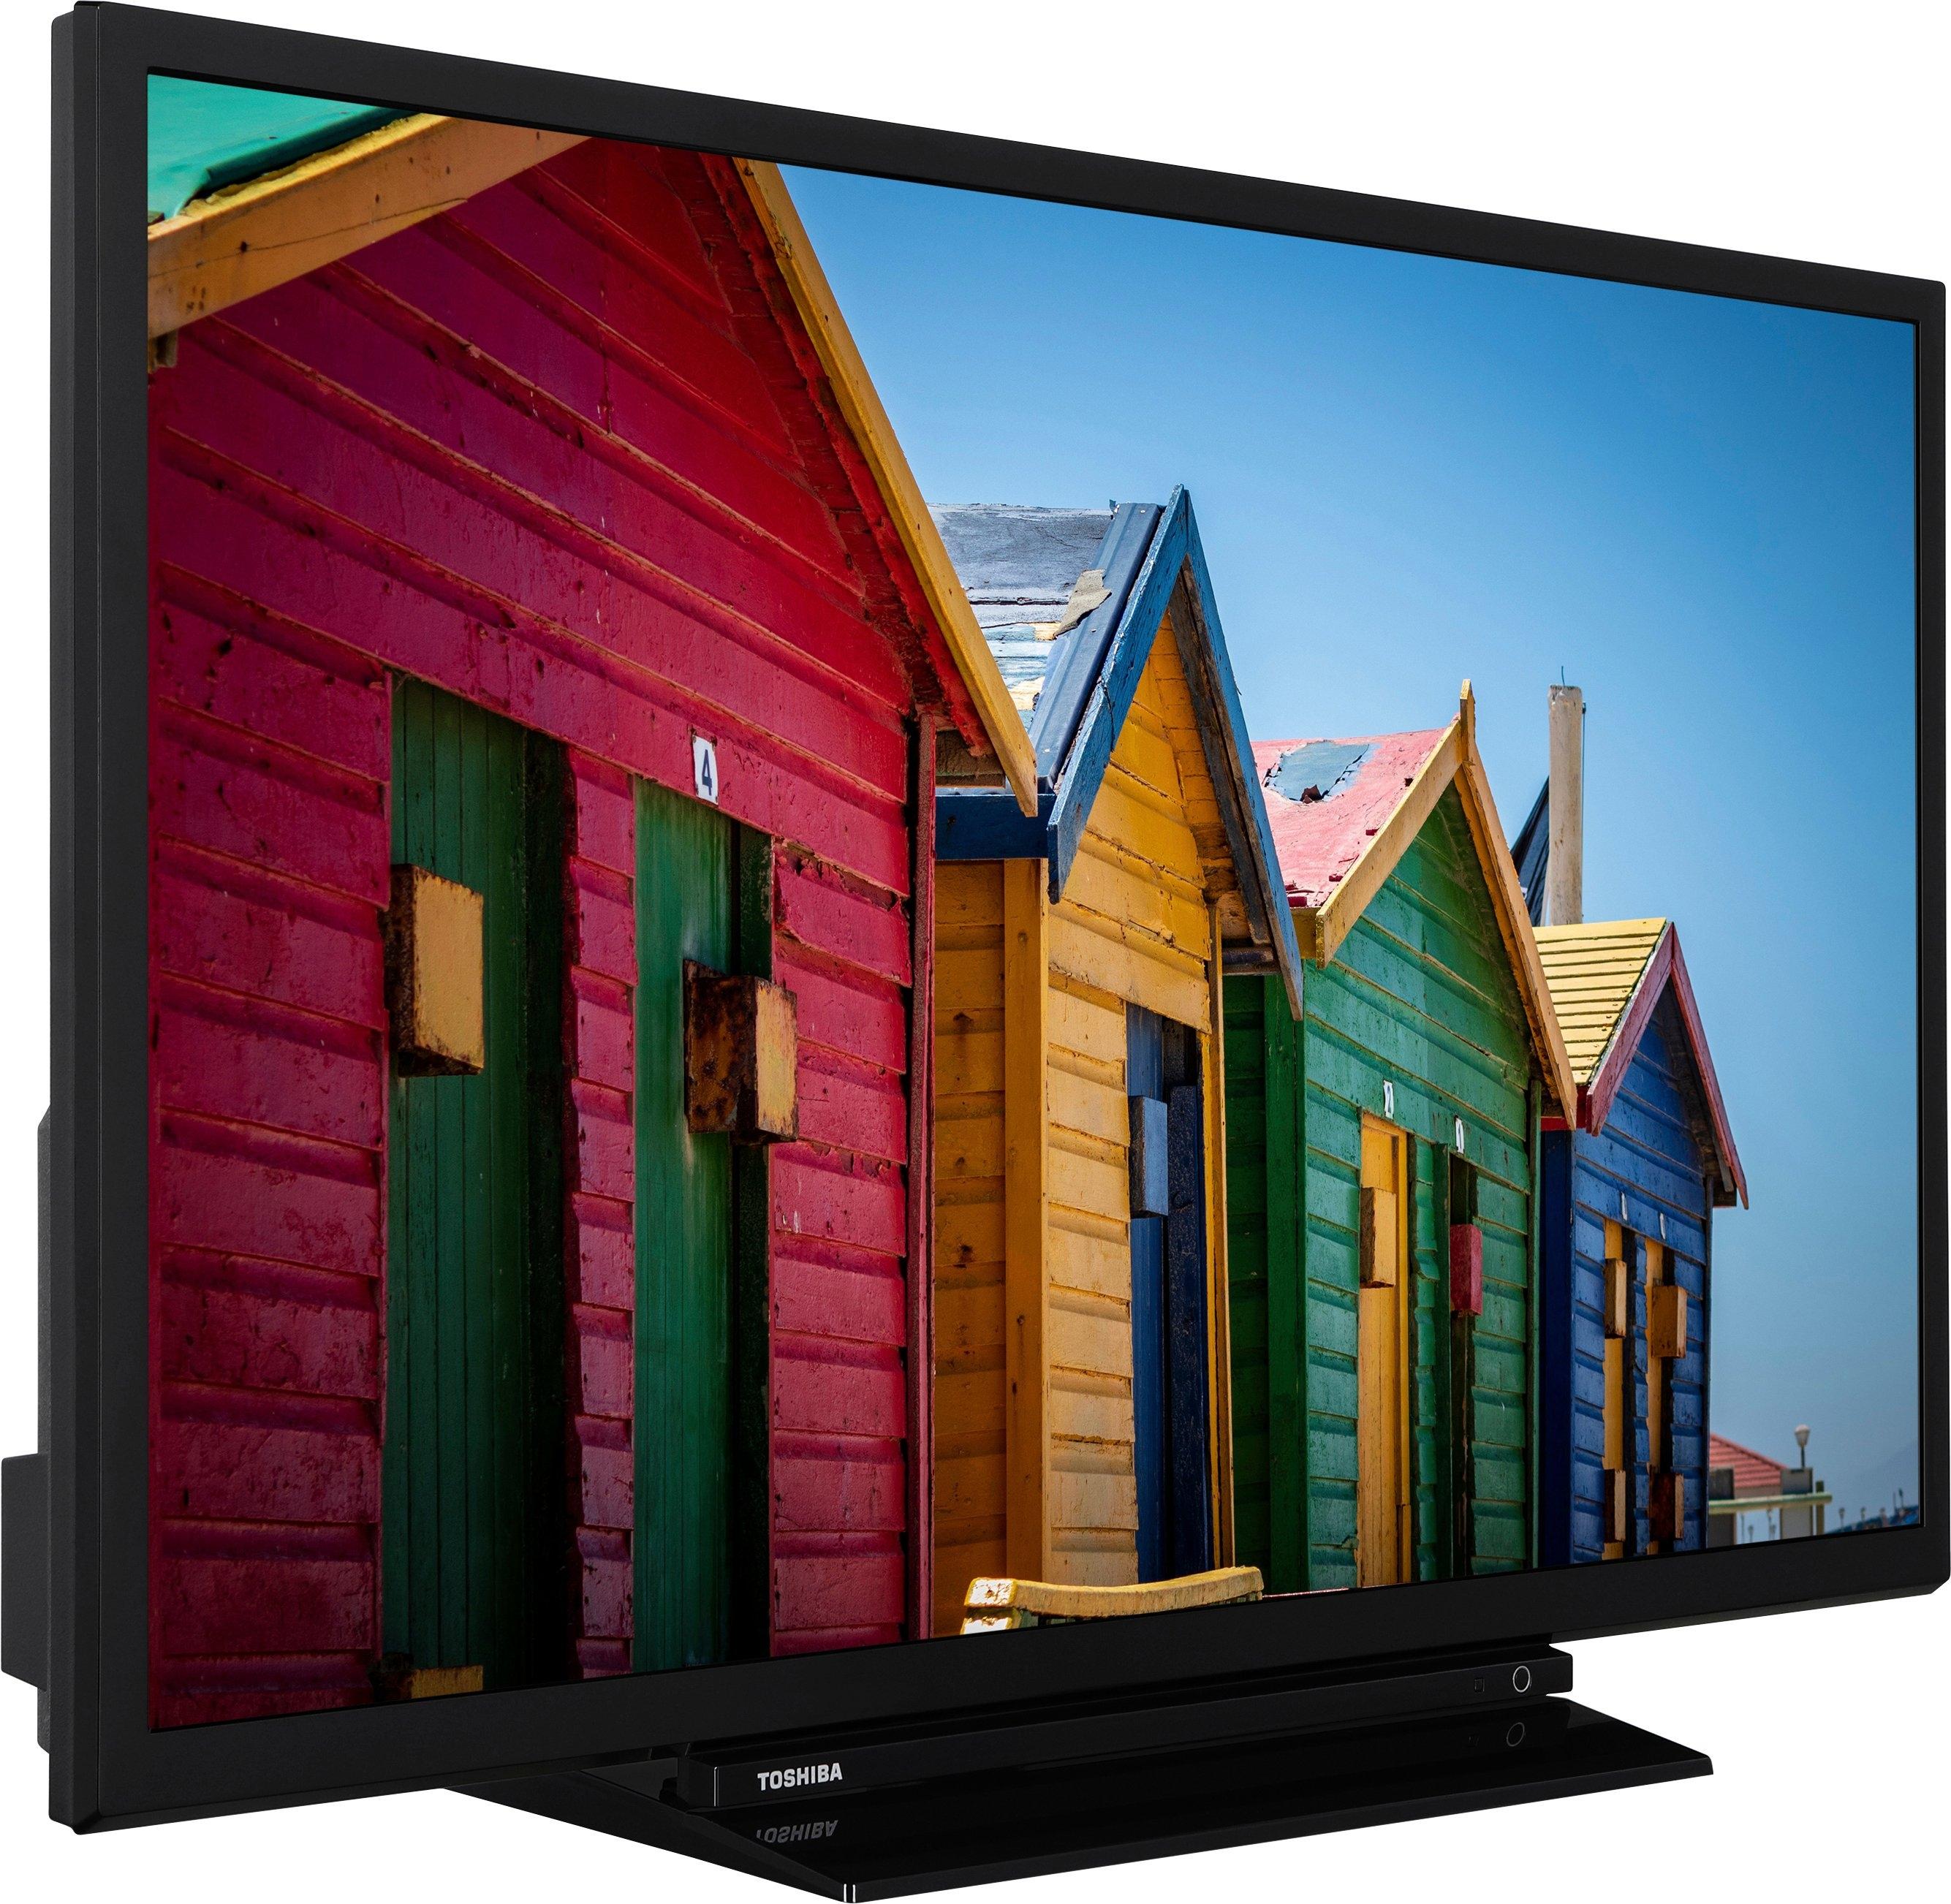 Toshiba 32L3963DA LED-televisie (80 cm / (32 Inch), Full HD, Smart-TV in de webshop van OTTO kopen